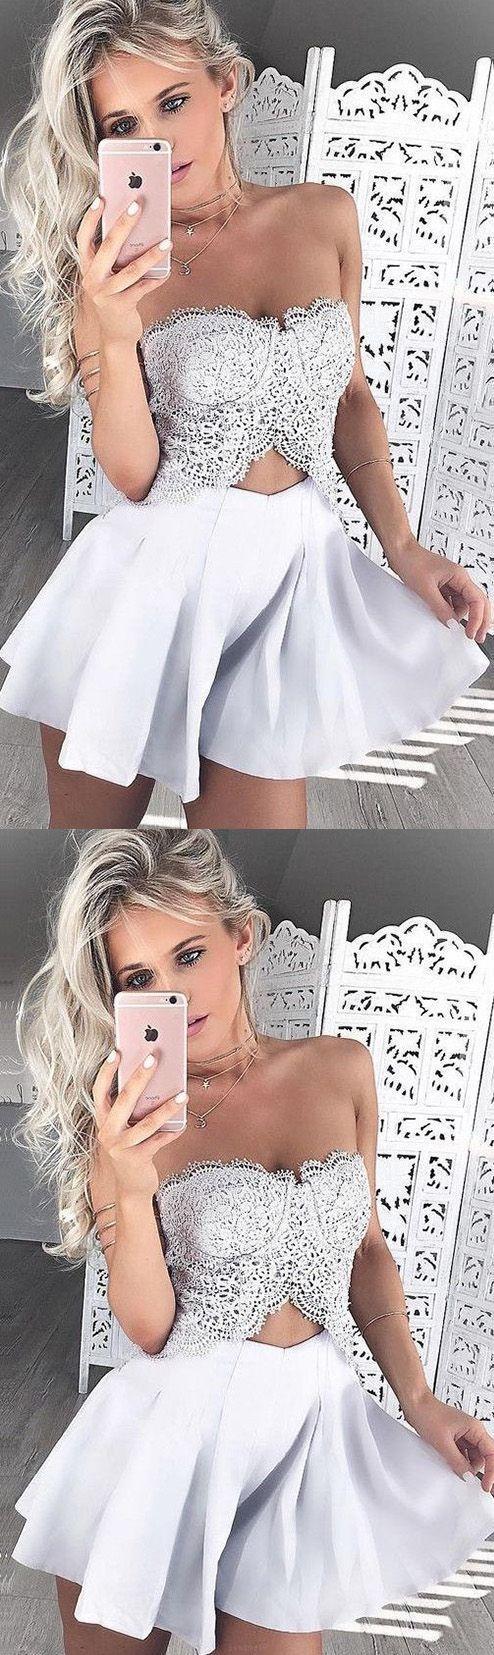 Mariage - Custom Made Beaded/Beading White Homecoming Party Dresses Nice Short Sweetheart Sleeveless Backless Dresses WF02G58-382